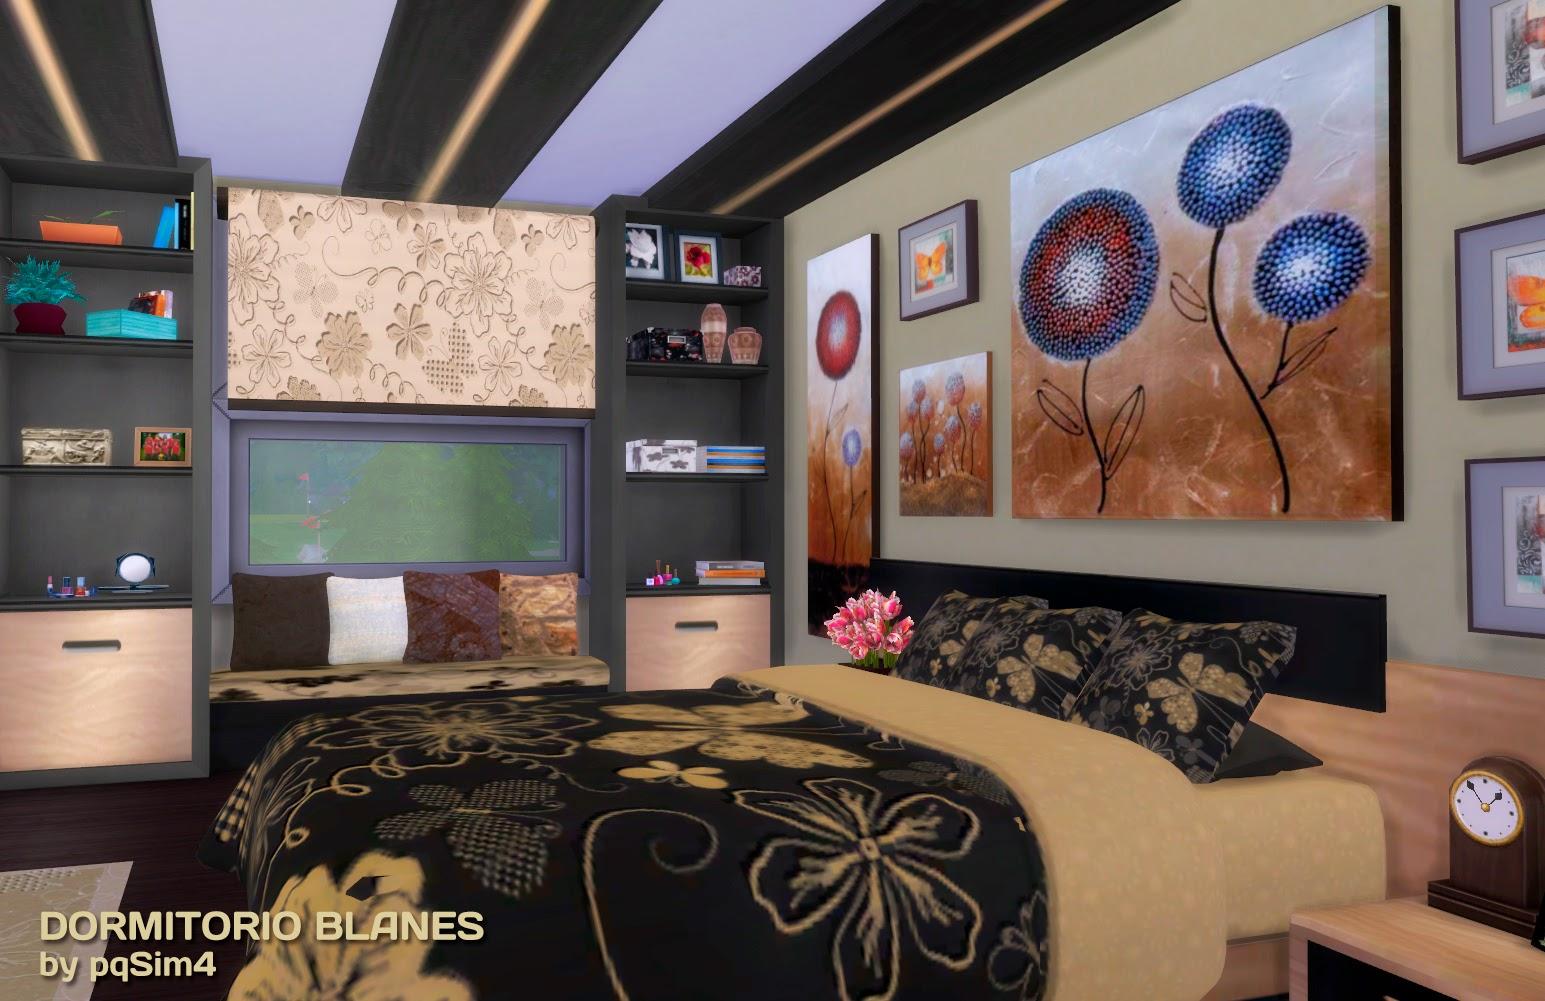 Sims 4 dormitorio blanes for Dormitorio sims 4